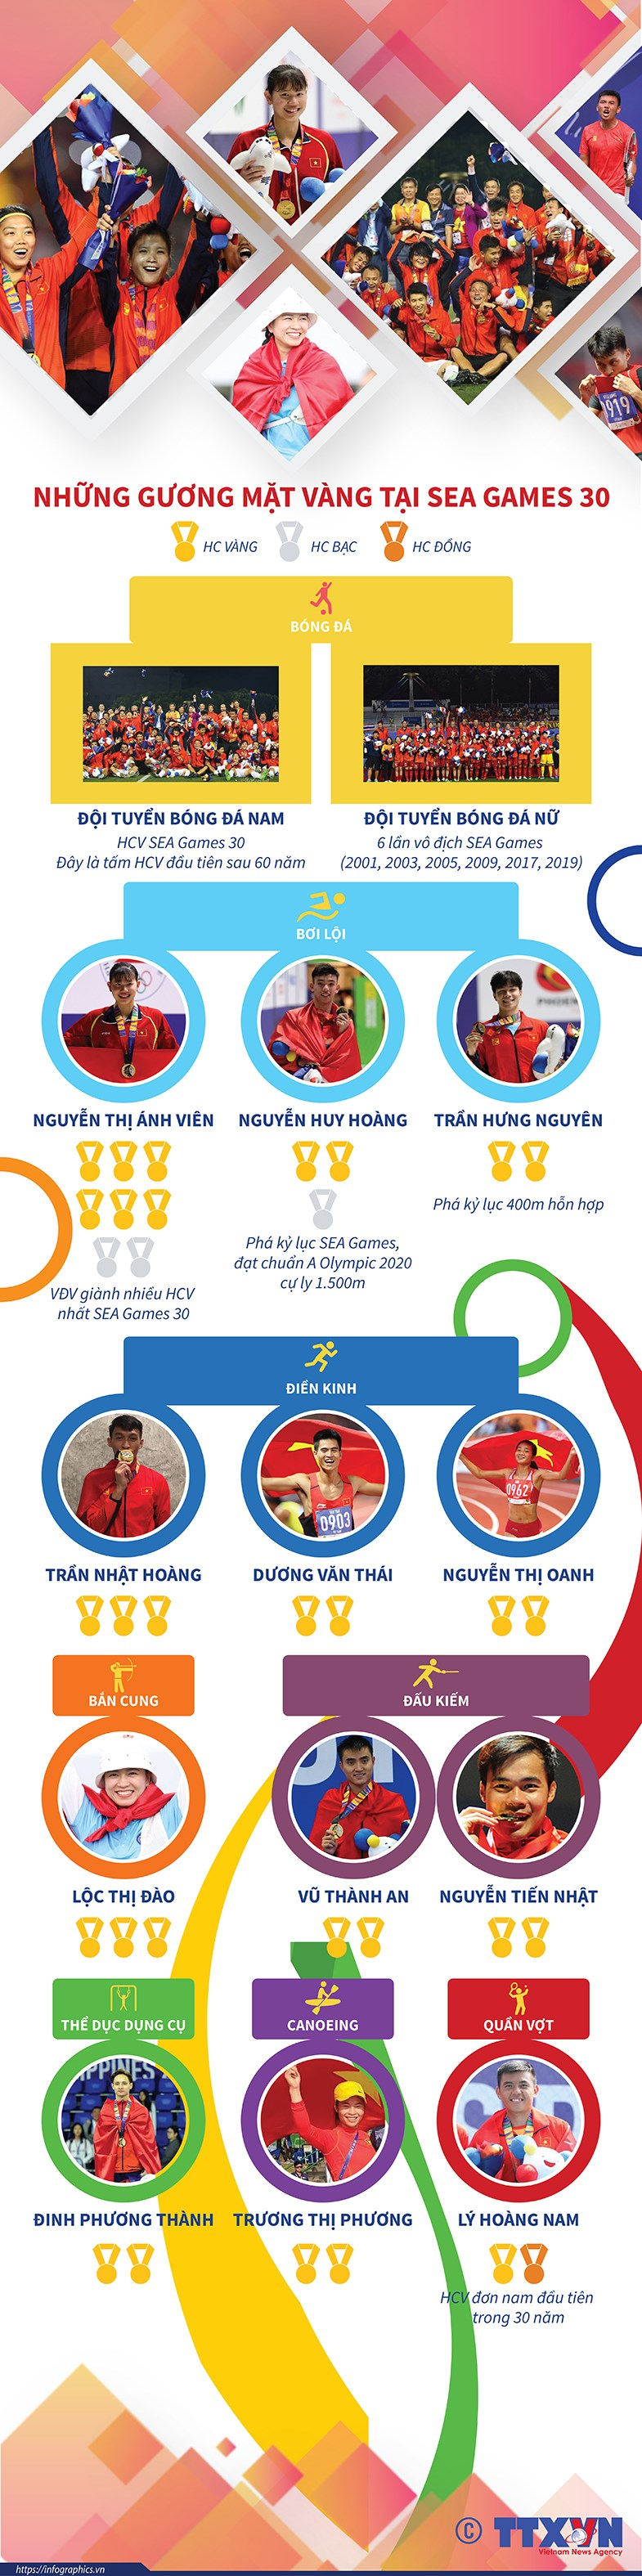 [Infographics] Nhung guong mat vang the thao Viet Nam tai Sea Games 30 hinh anh 1